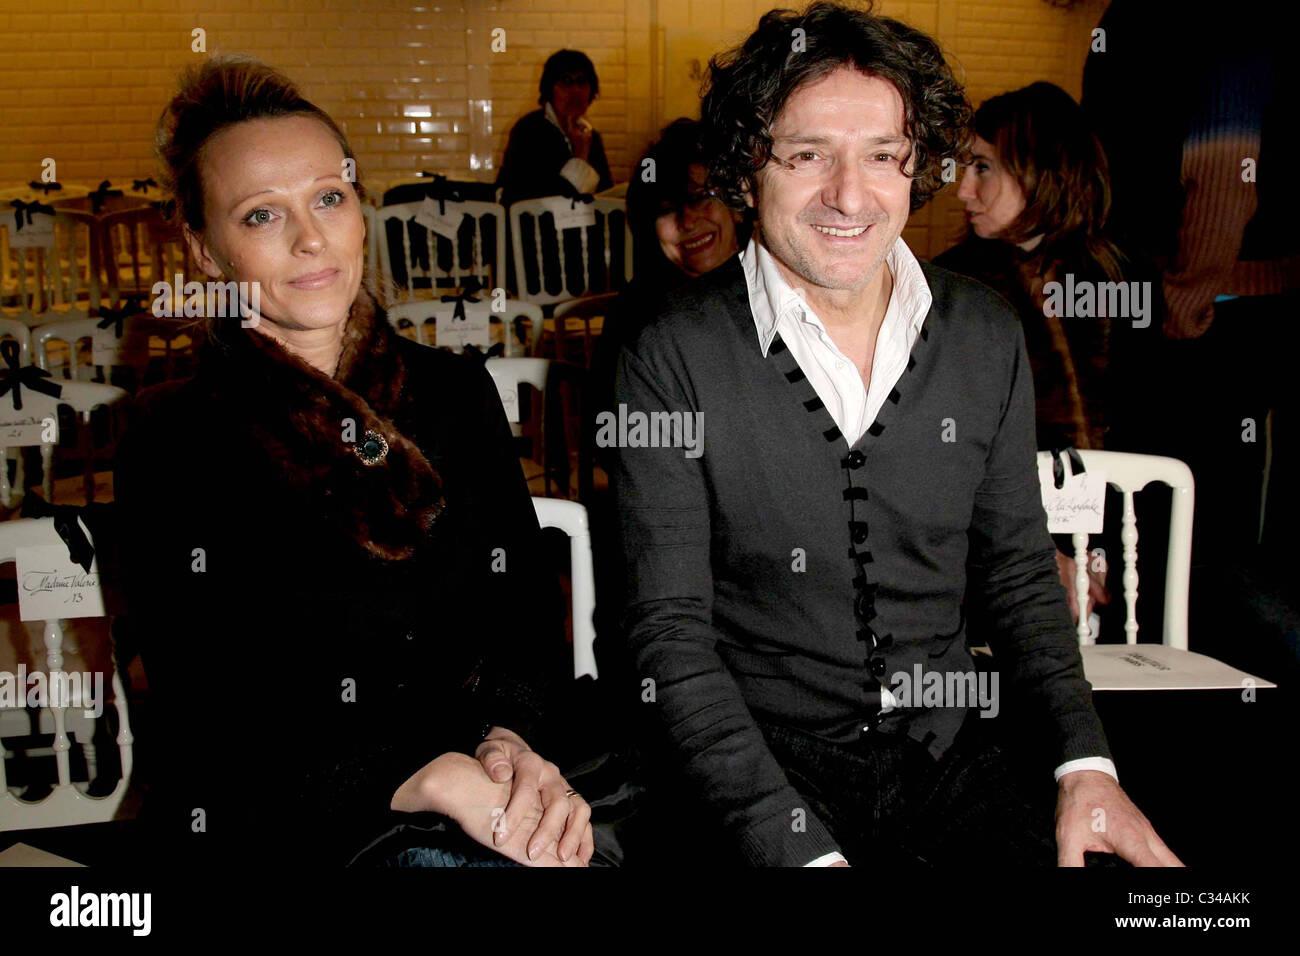 Dzenana Sudzuka and Goran Bregović Paris Fashion Week ...